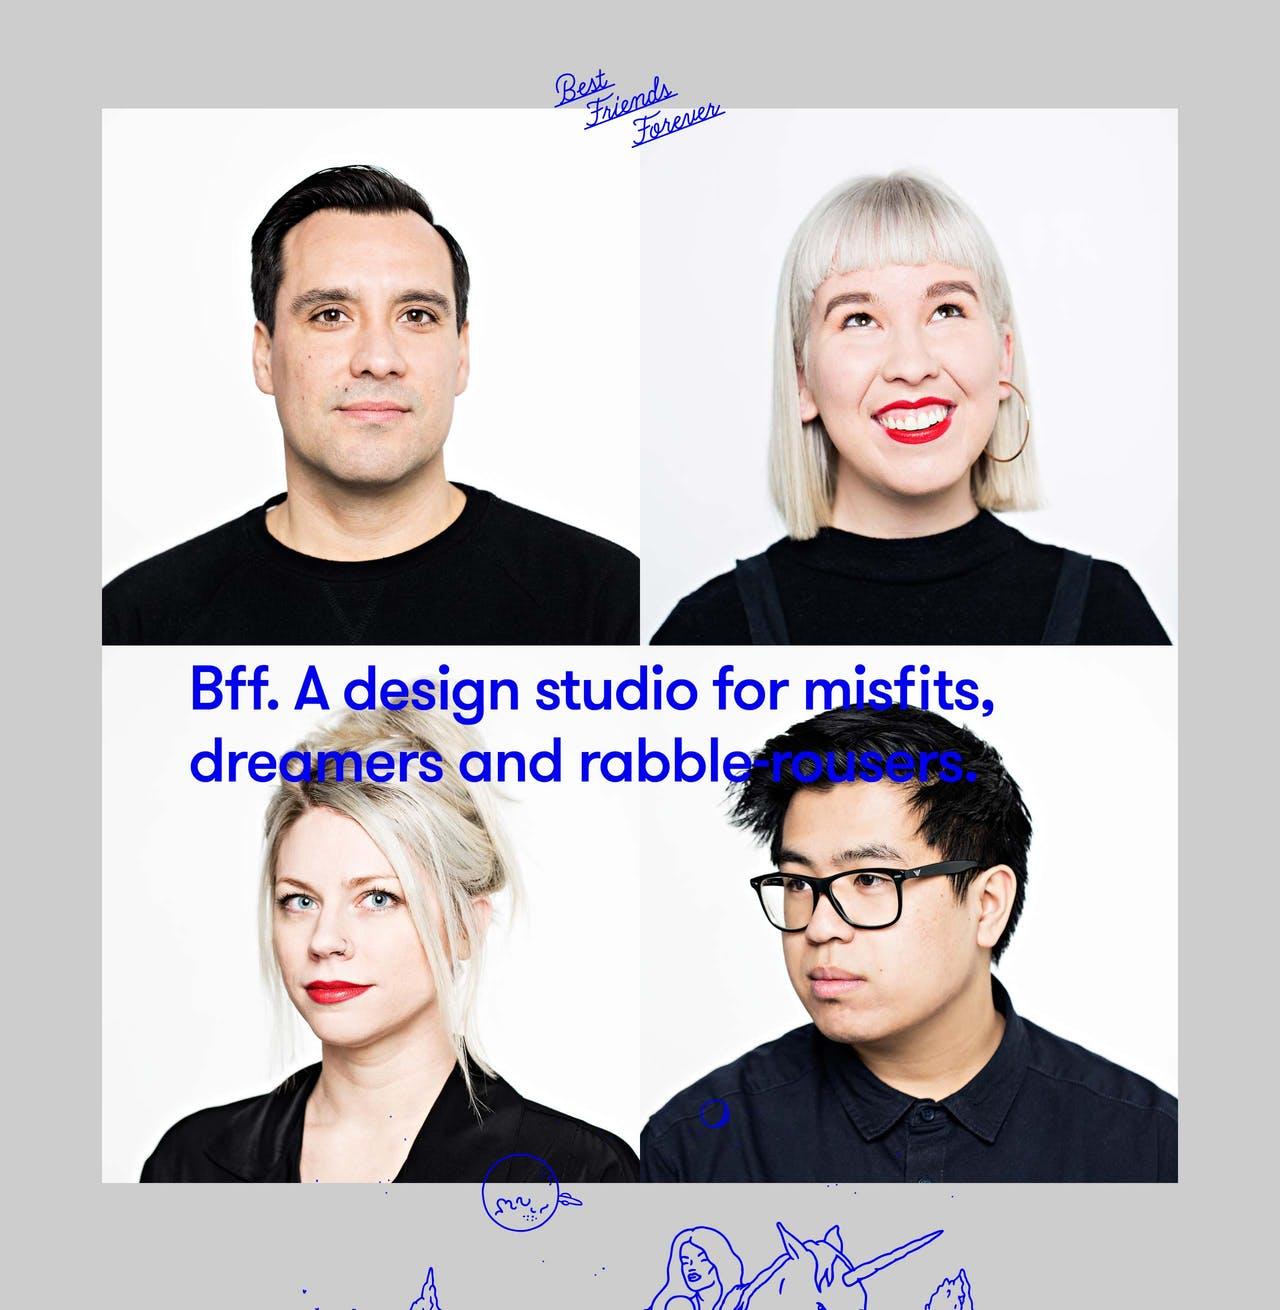 Team Section - Bff Screenshot